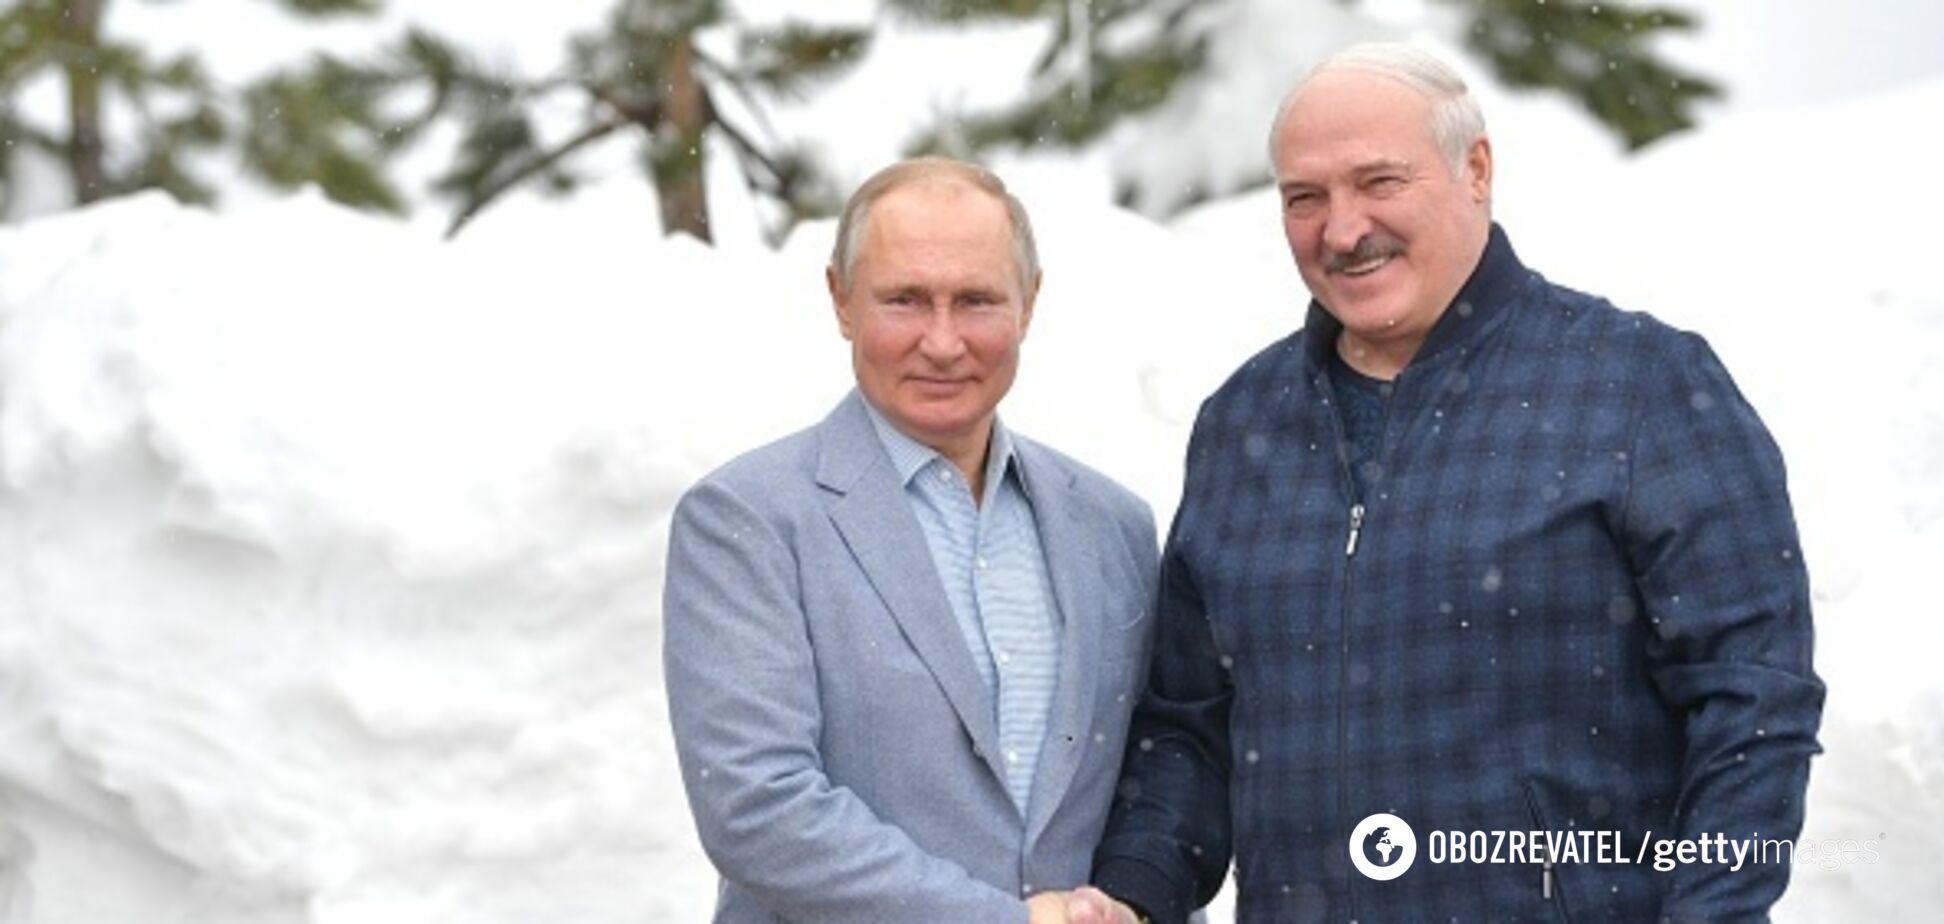 Главы России и Беларуси Владимир Путин и Александр Лукашенко